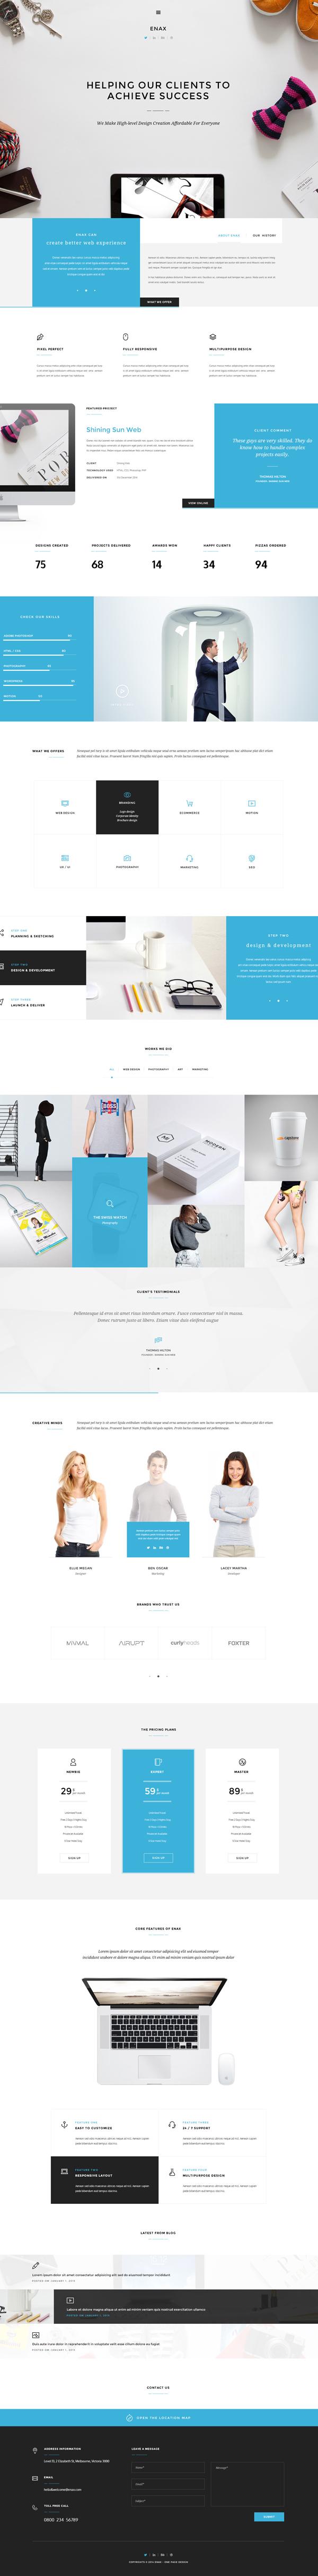 Enax - A Stylish and Modern Corporate Theme